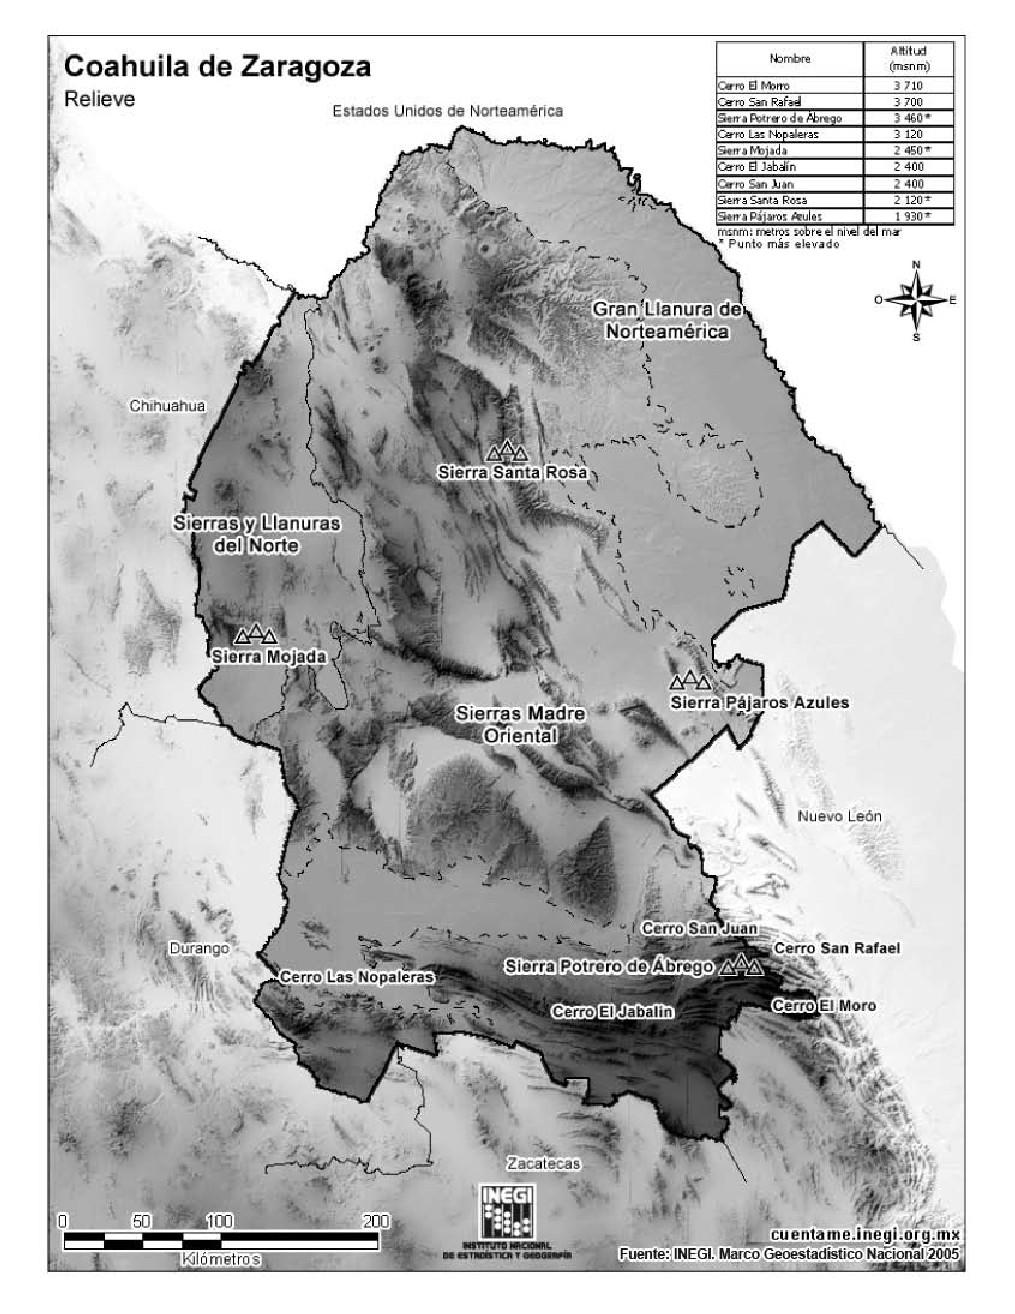 Mapa de montañas de Coahuila de Zaragoza. INEGI de México